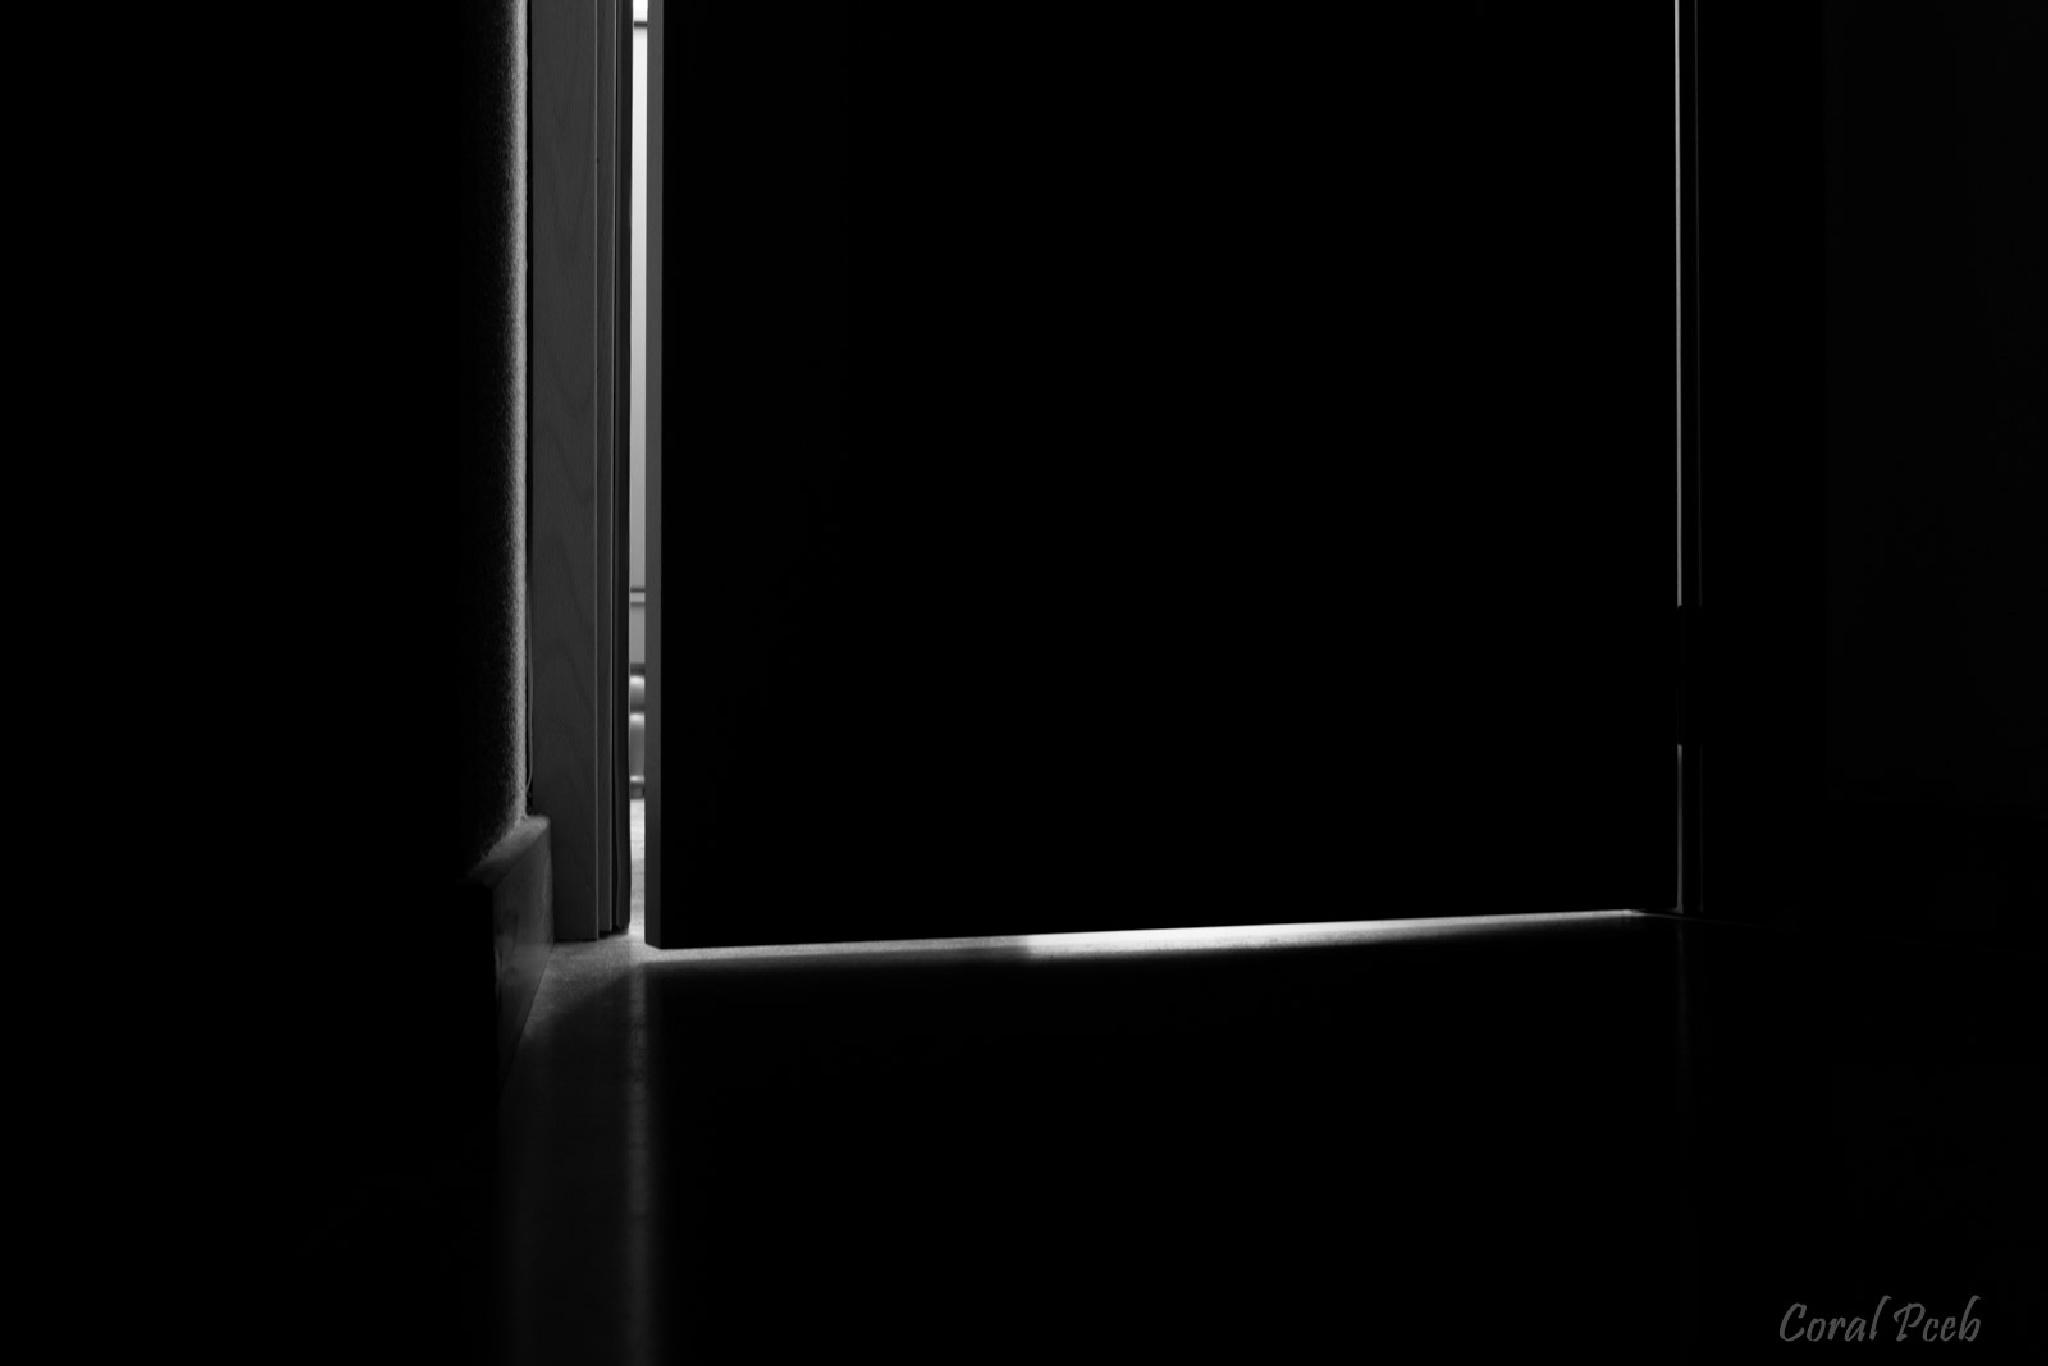 Behind the door by CoralPceb